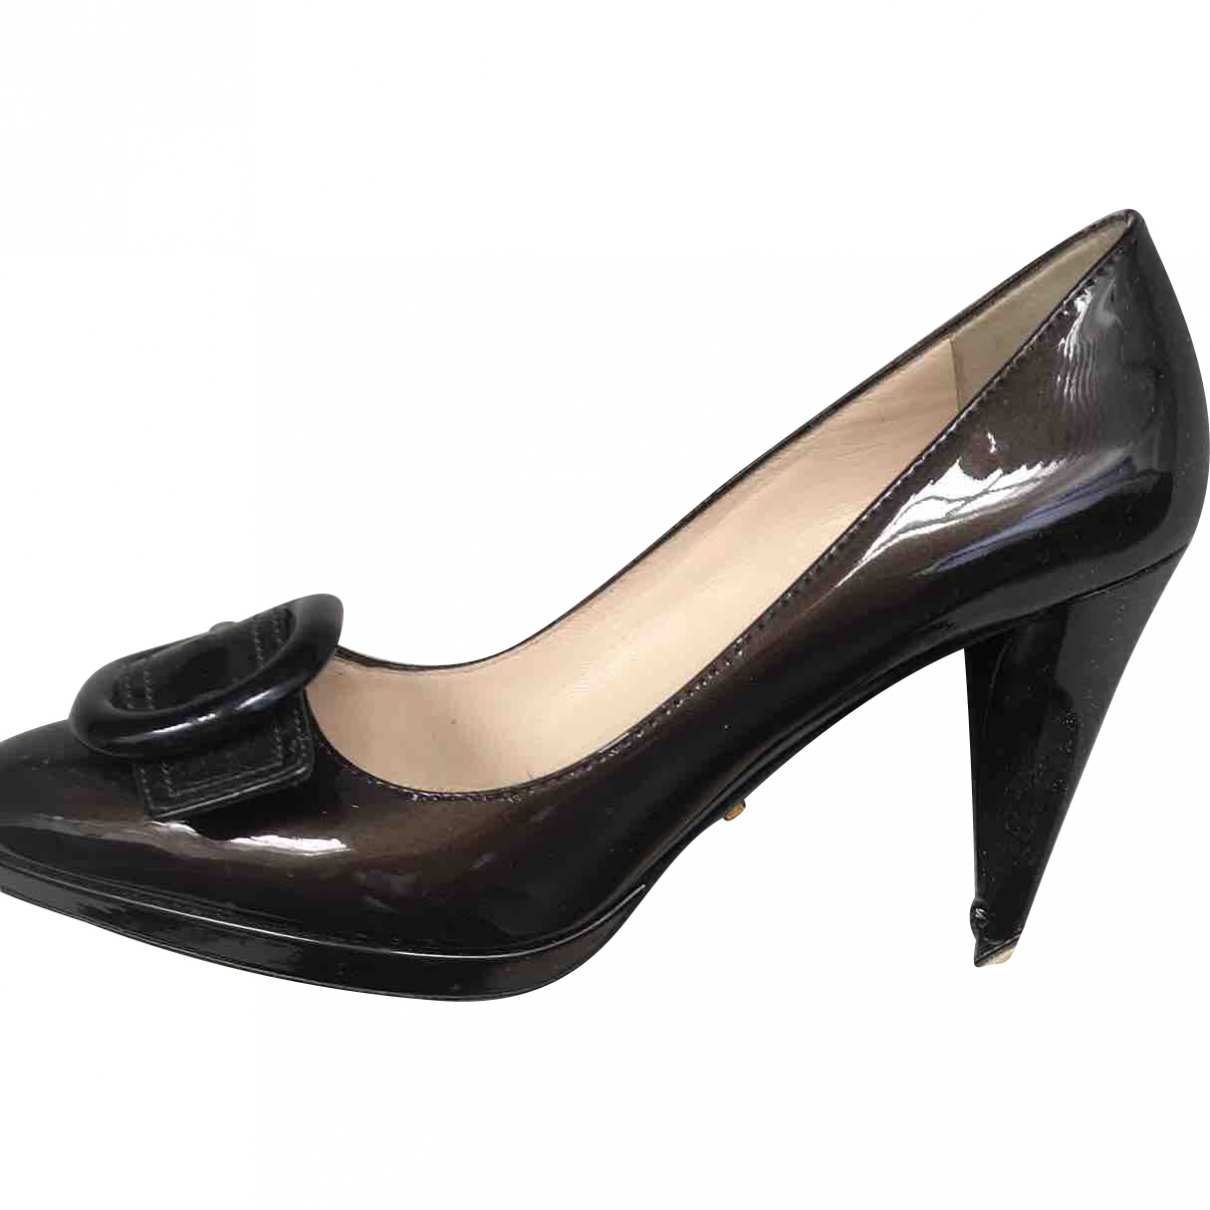 Prada \N Anthracite Patent leather Heels for Women 37 EU